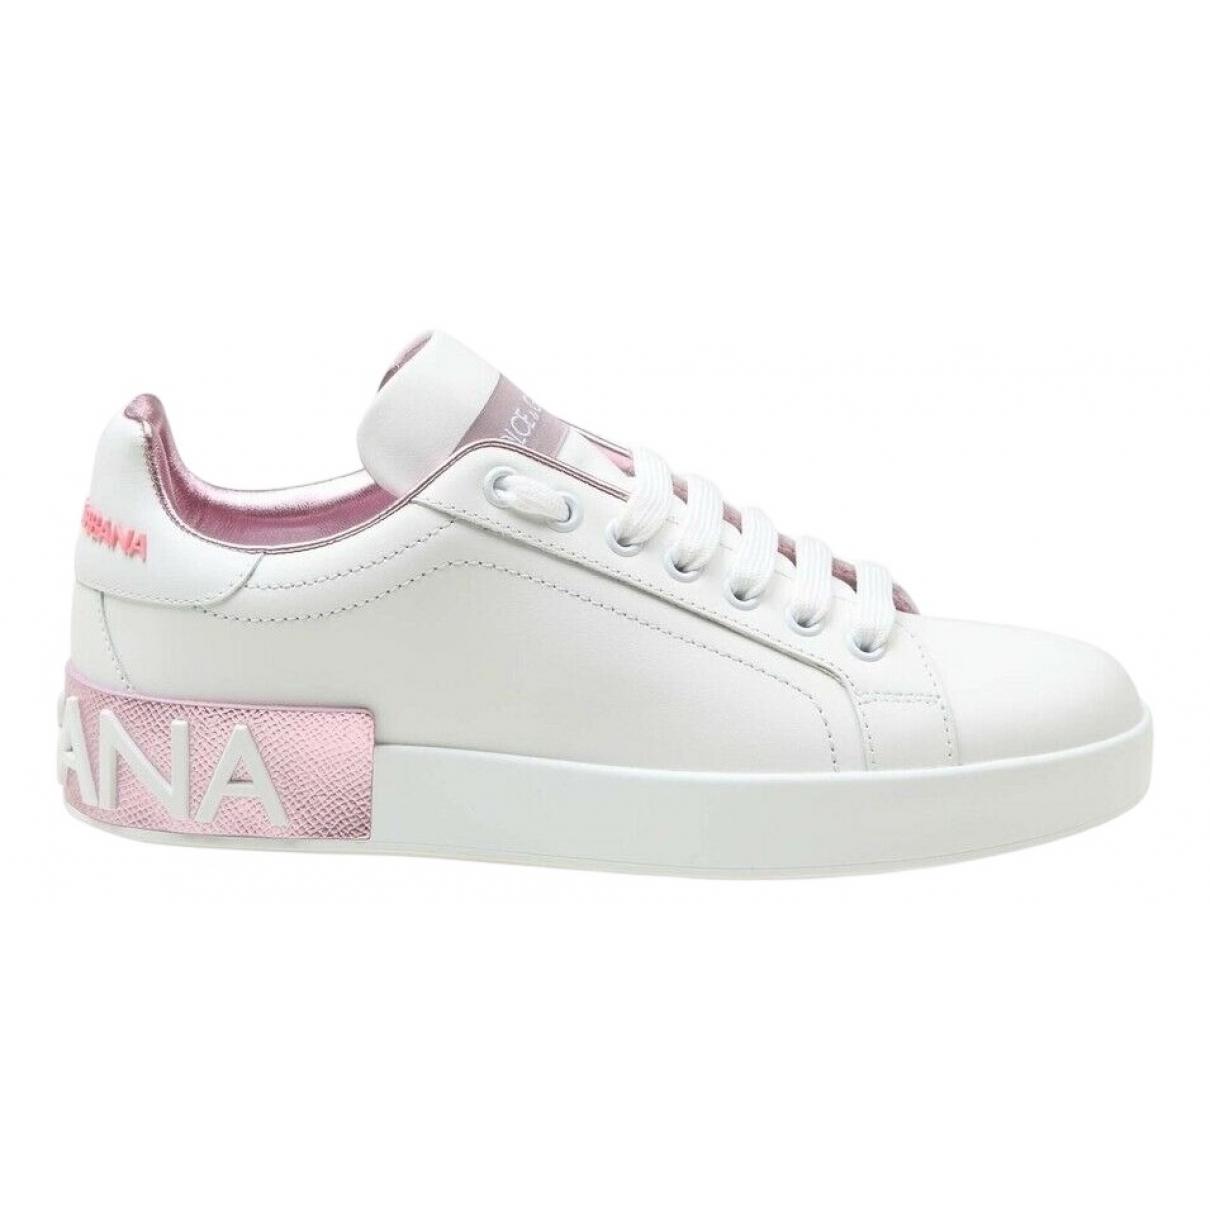 Dolce & Gabbana - Baskets Portofino pour femme en cuir - blanc